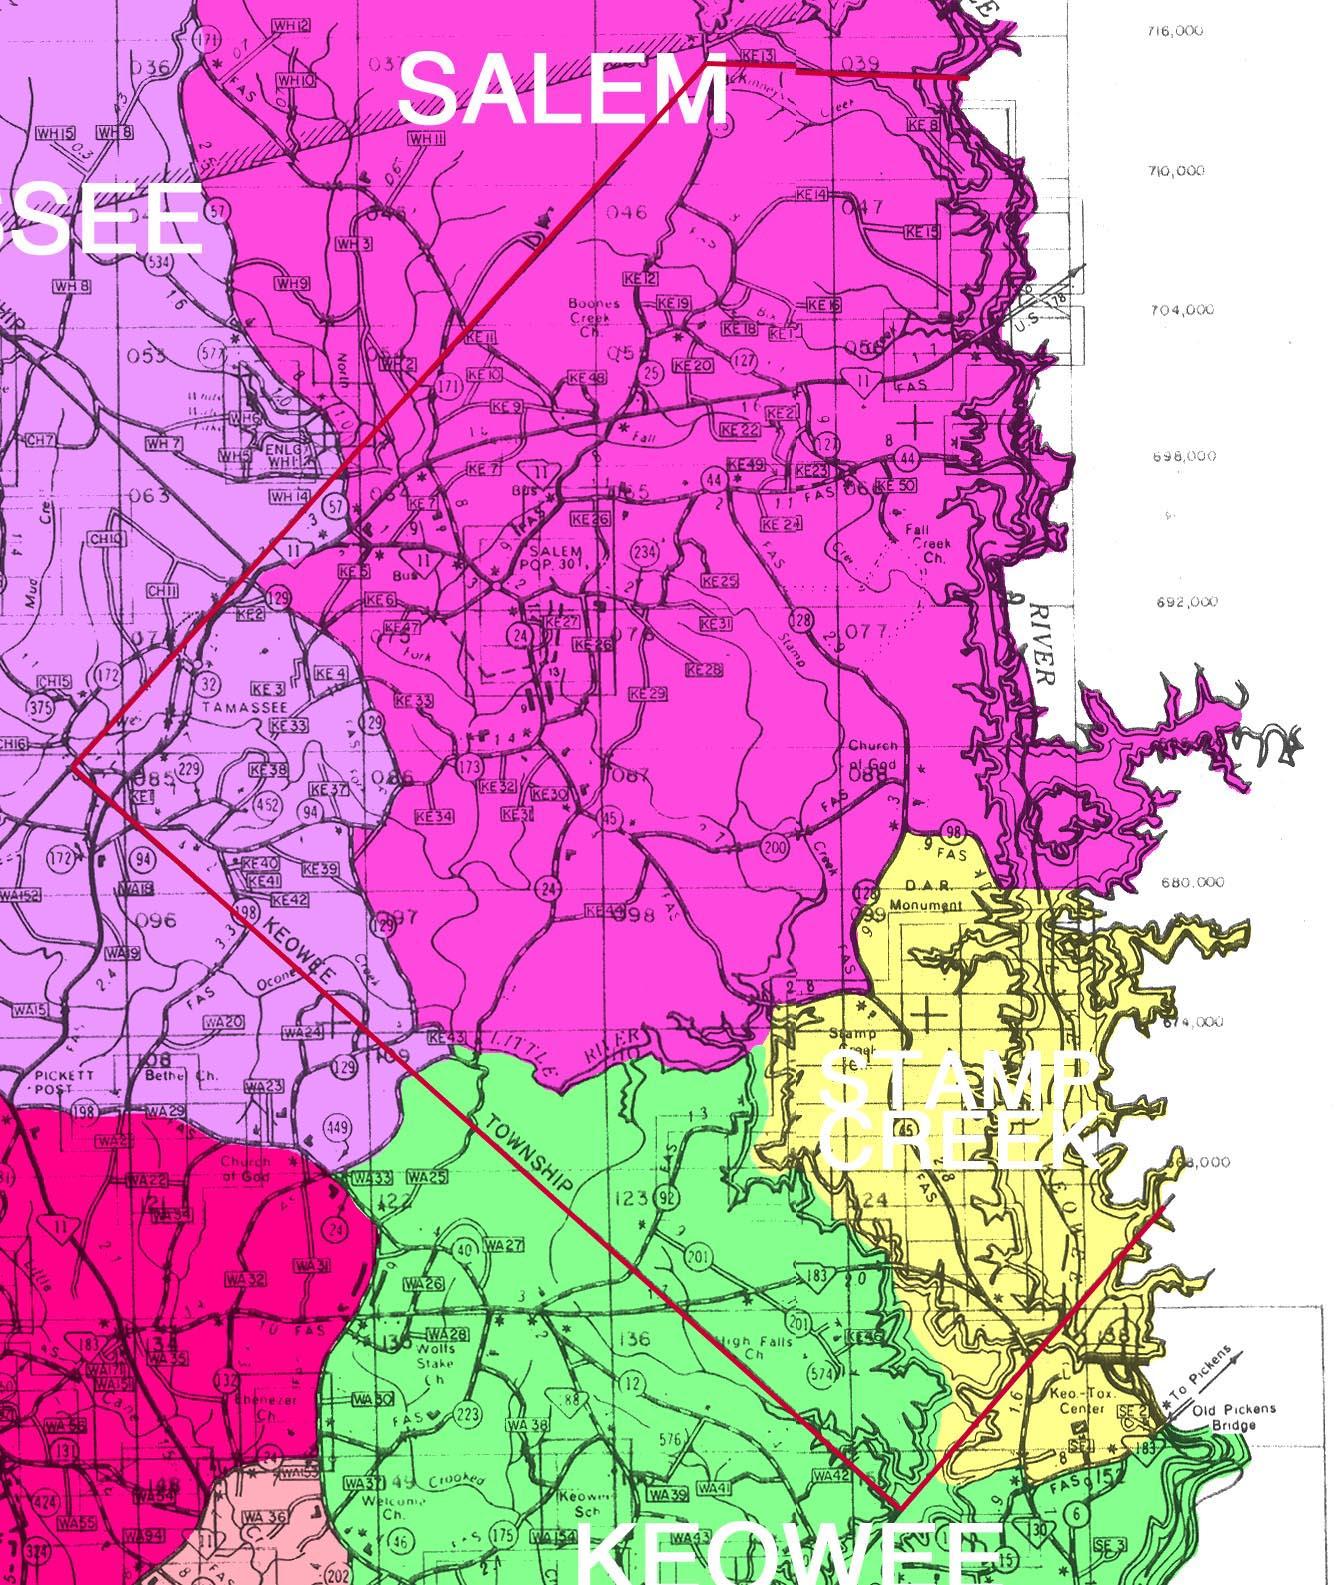 Anderson-Oconee-Pickens County SC Maps & Places